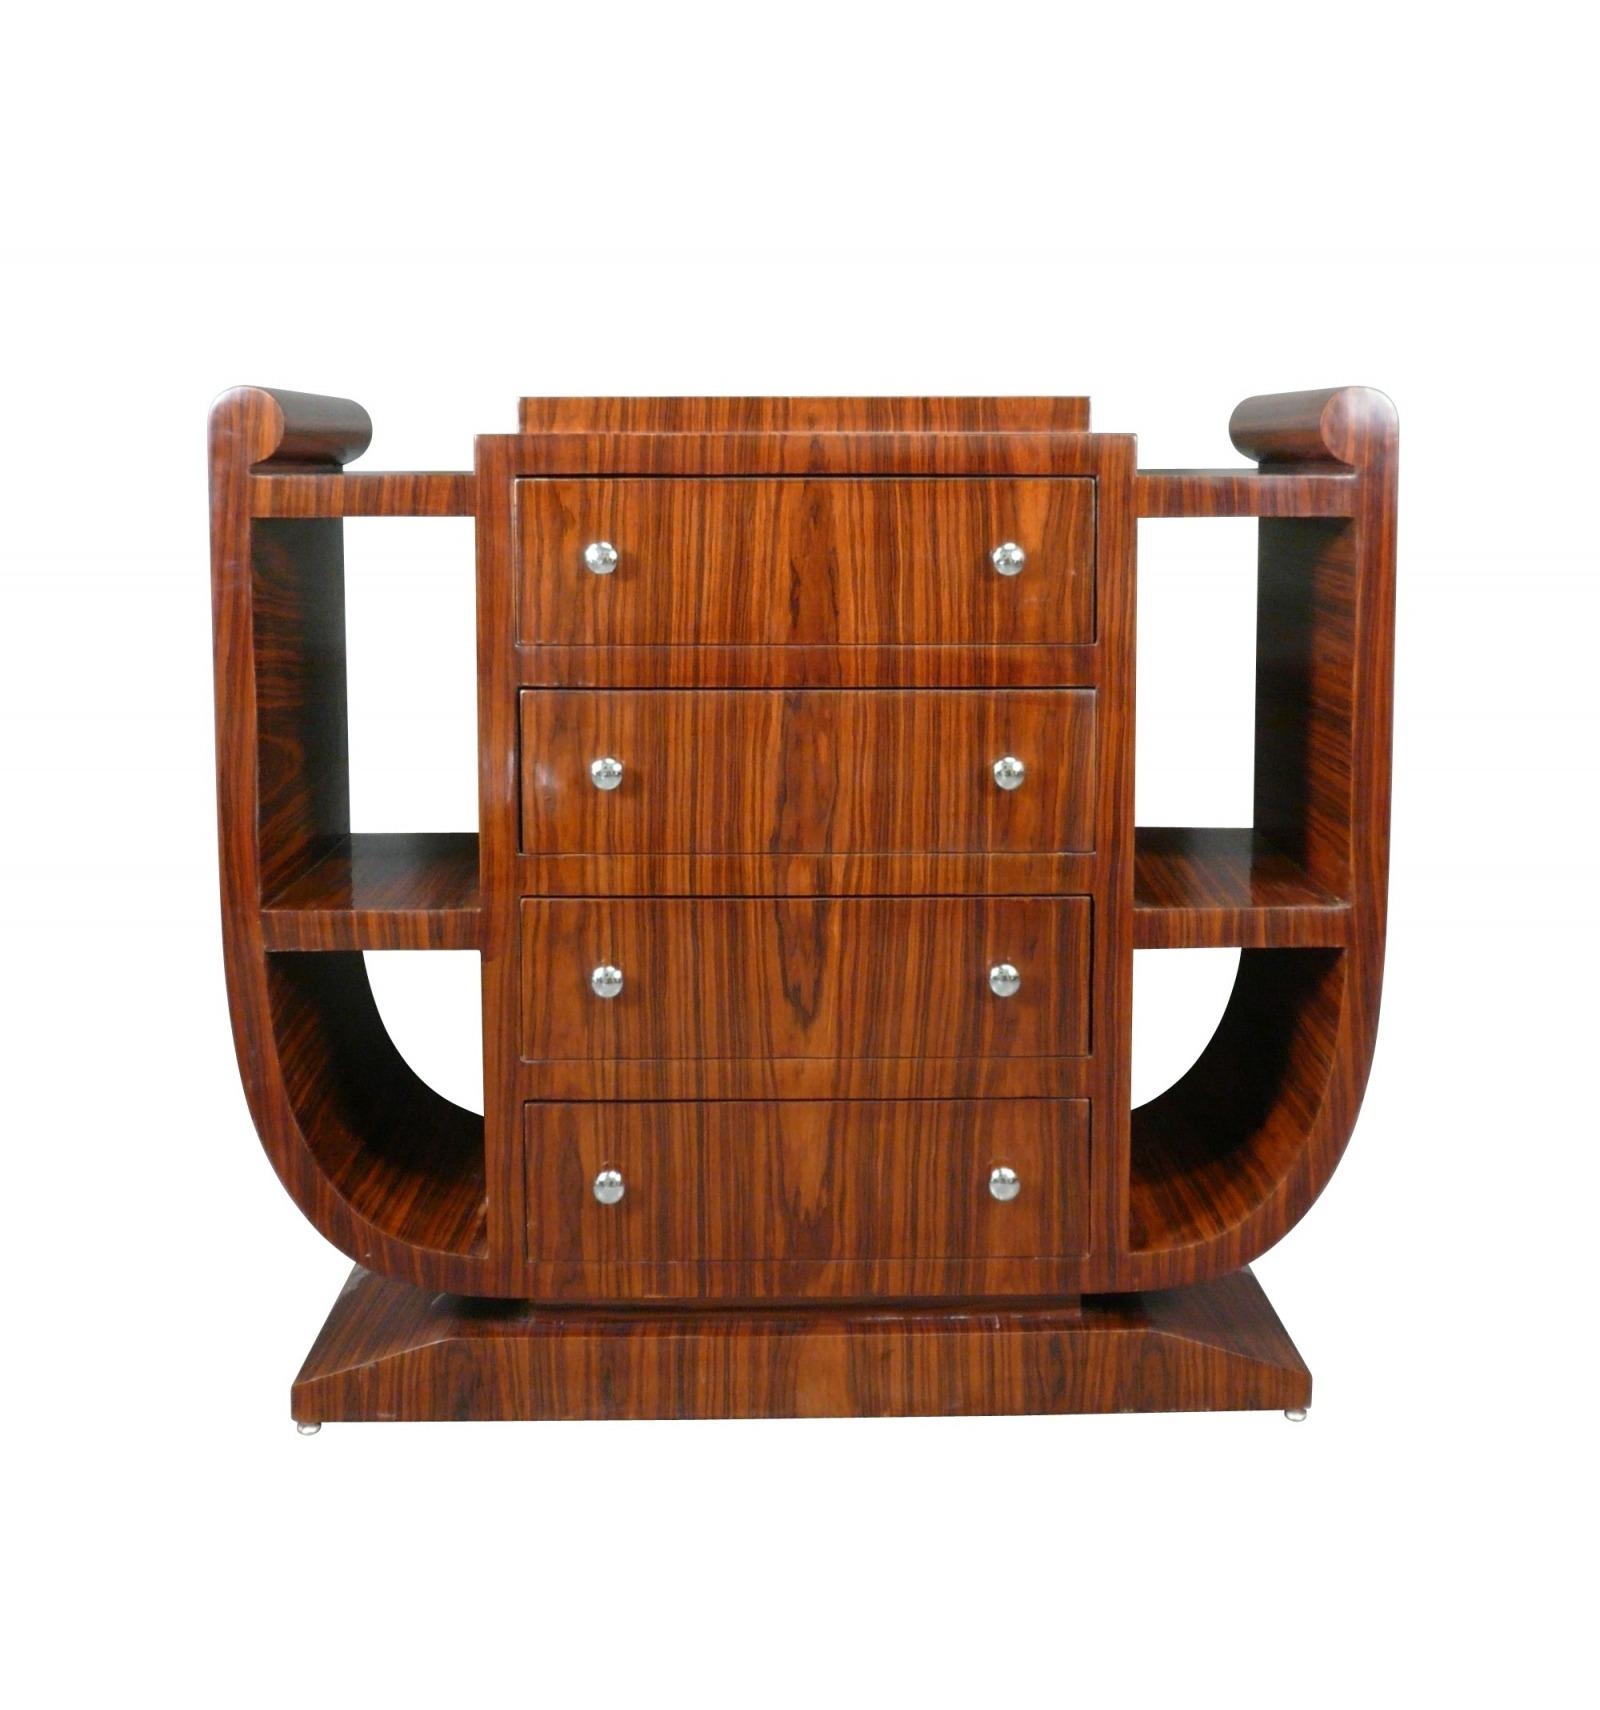 Picture of: Art Deco Dresser Art Deco Furniture Style 1930